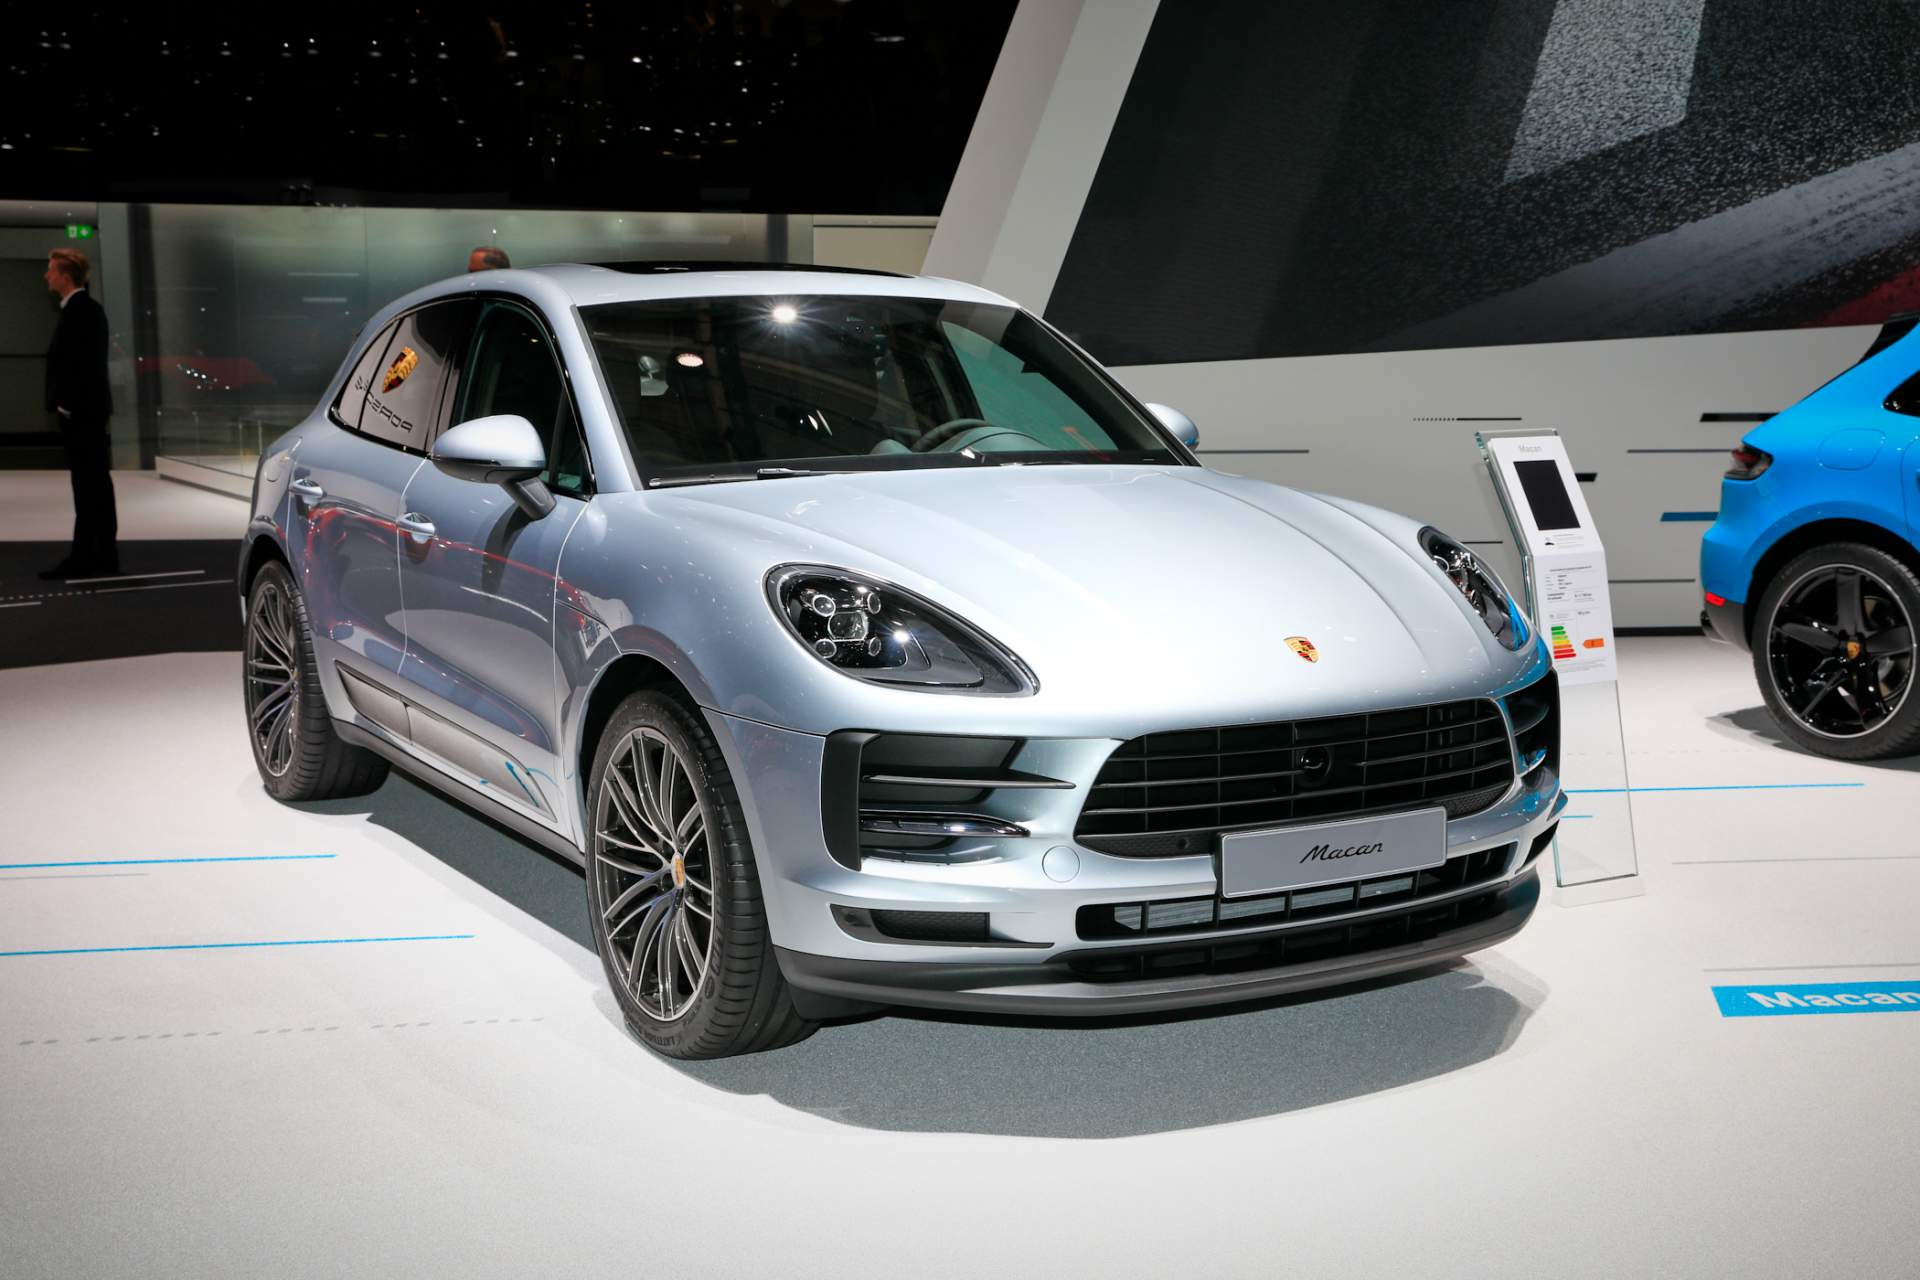 2018 Paris Motor Show: Porsche Macan (рестилизација)